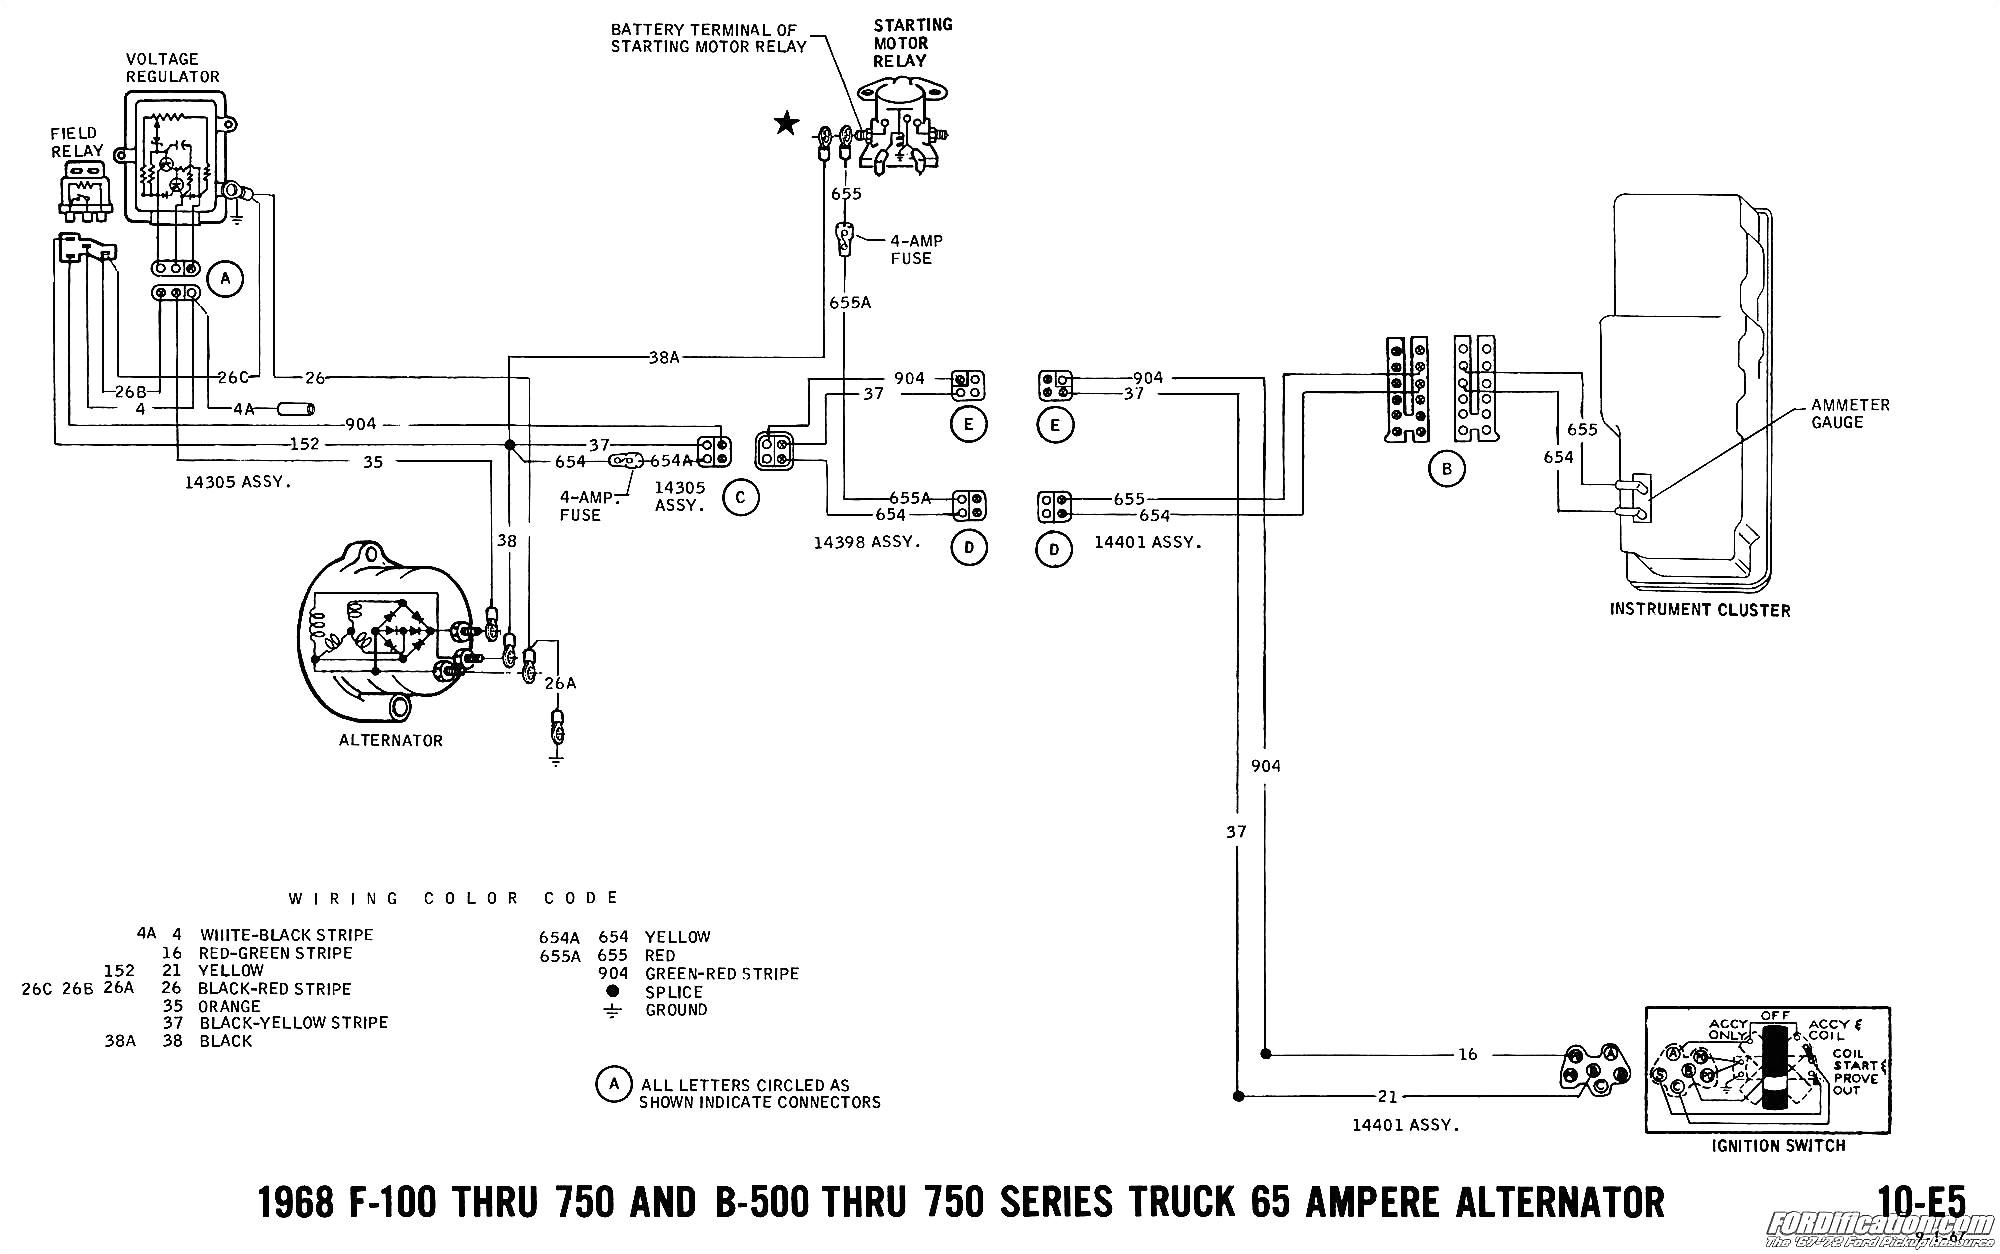 ford tractor alternator wiring diagram elegant wiring diagram alternator ford fresh wiring diagram alternator ford of ford tractor alternator wiring diagram jpg